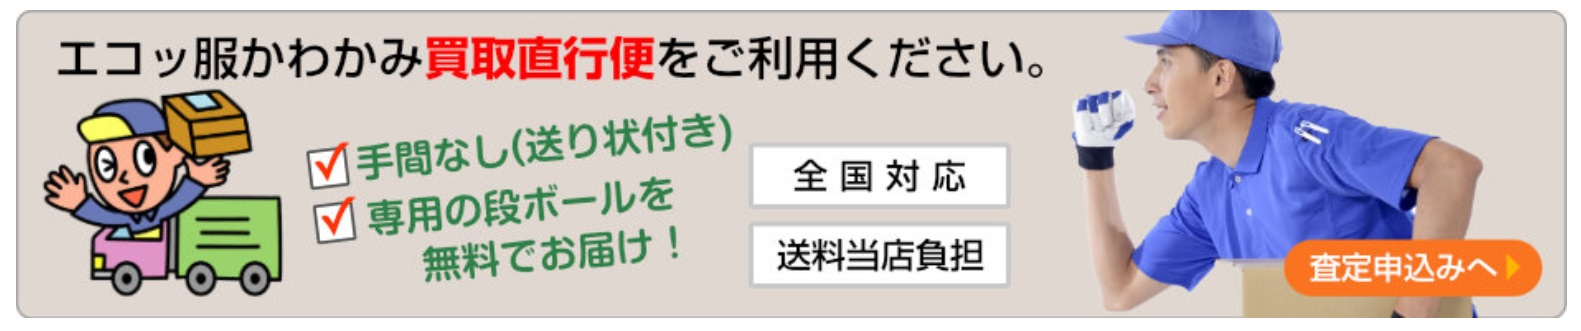 出典:http://www.ecofuku.net/